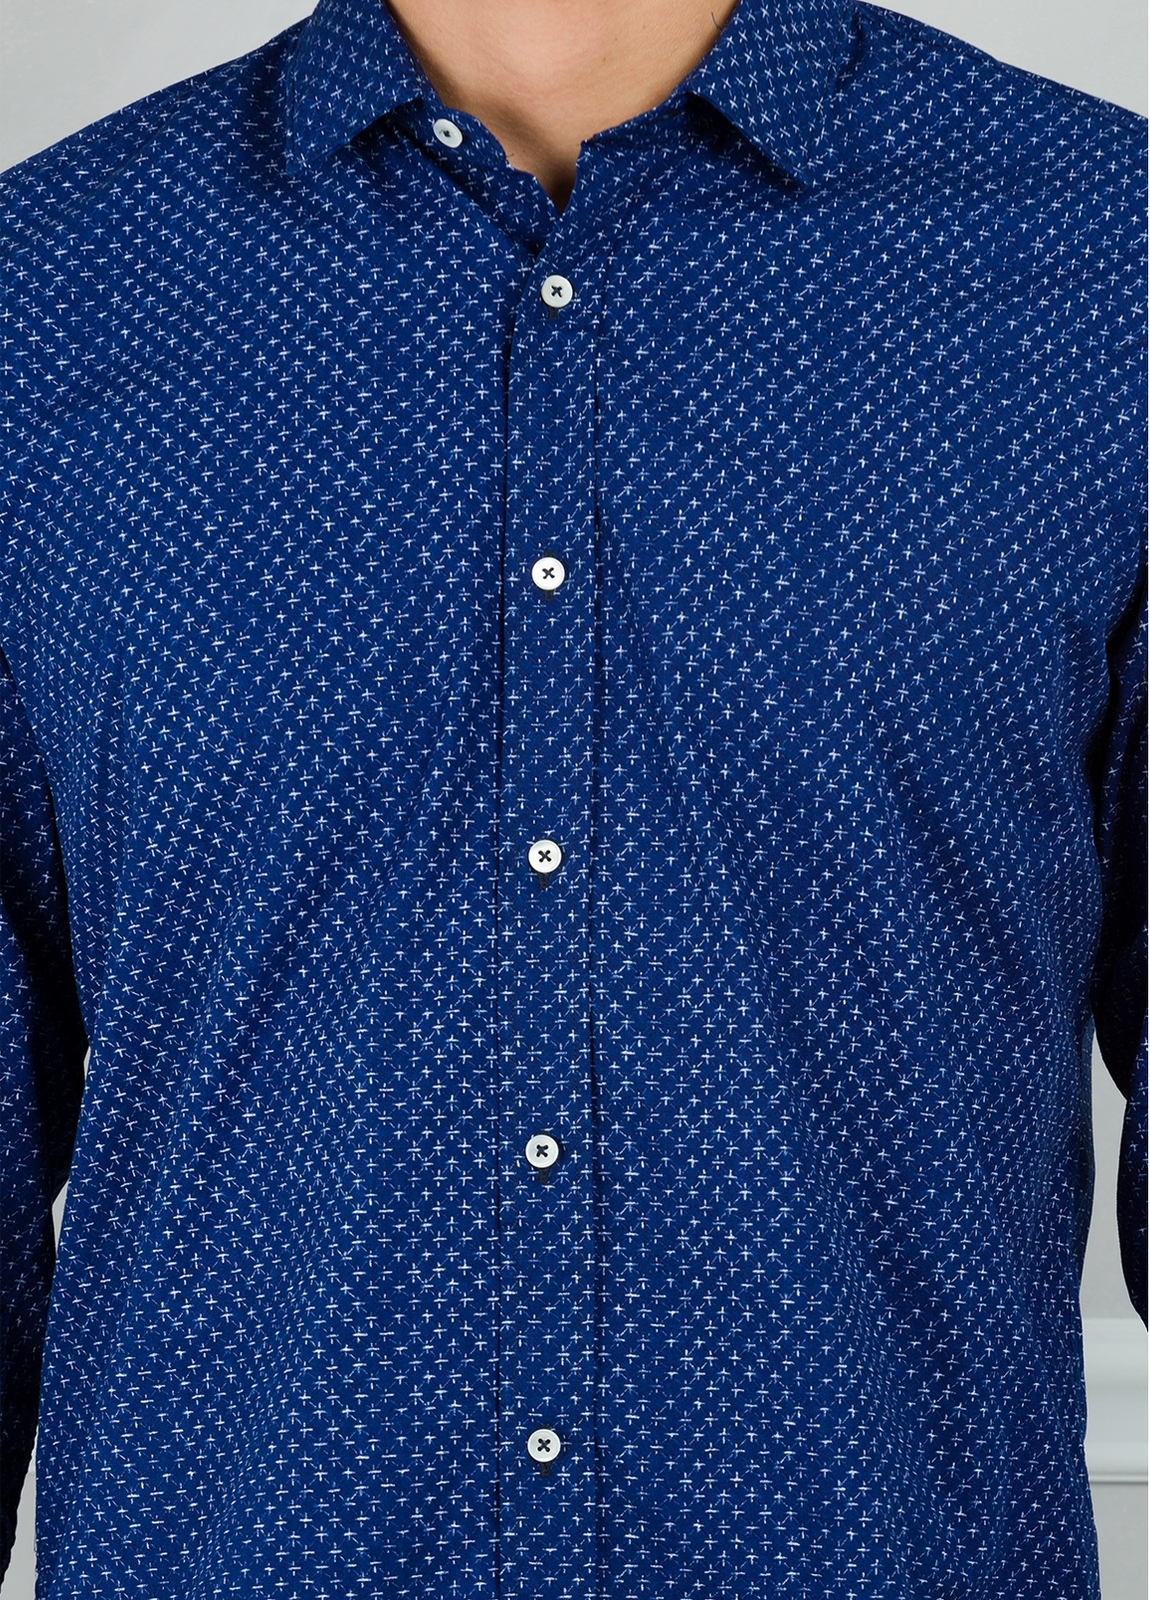 Camisa sport modelo EDDI micro dibujo azul. 100% Algodón lavado. - Ítem1